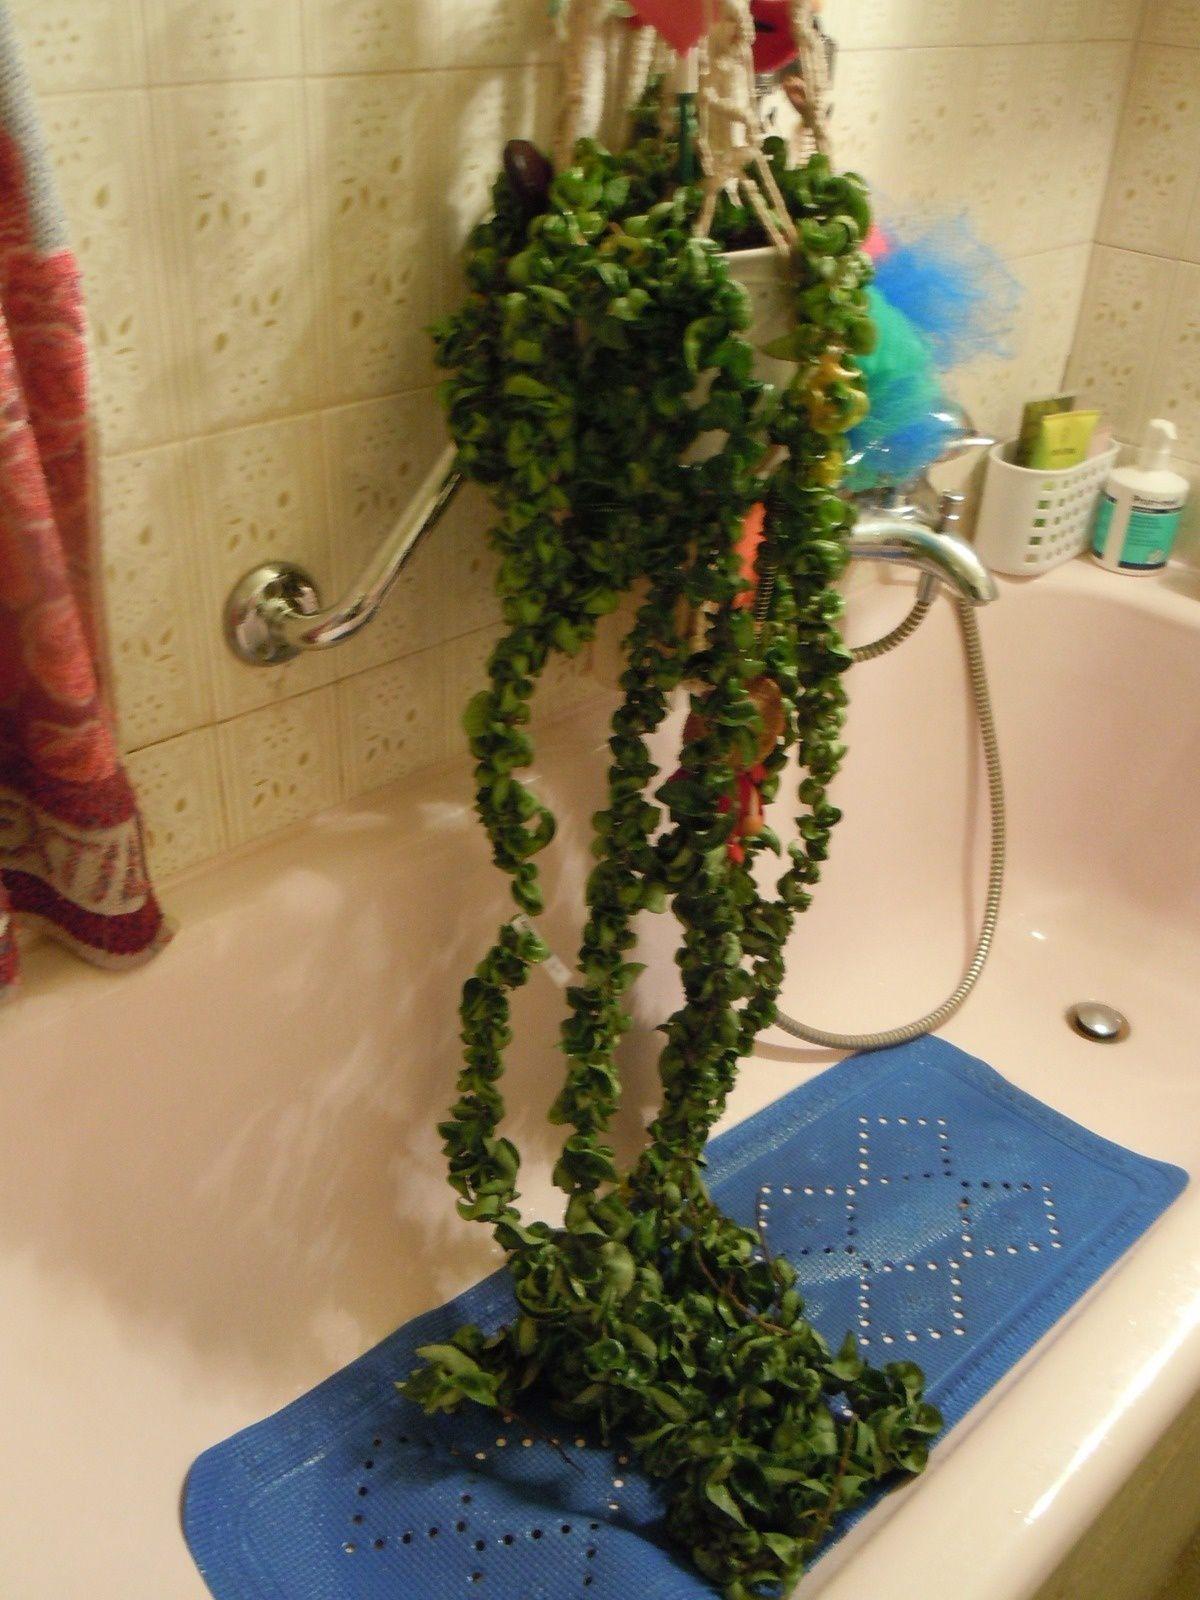 Hoya compacta sous la douche